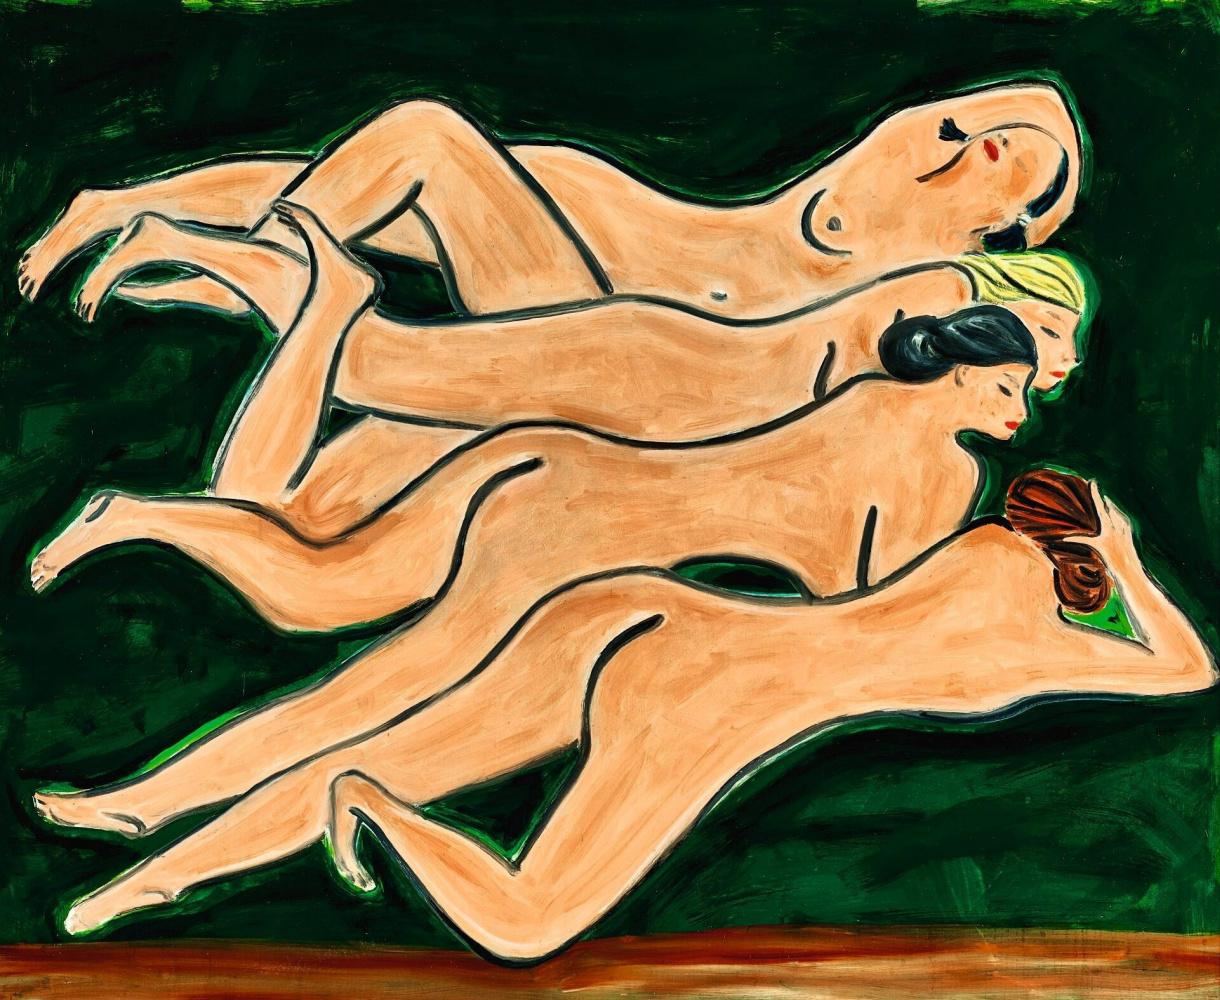 Sanya (Sanya). Four nudes